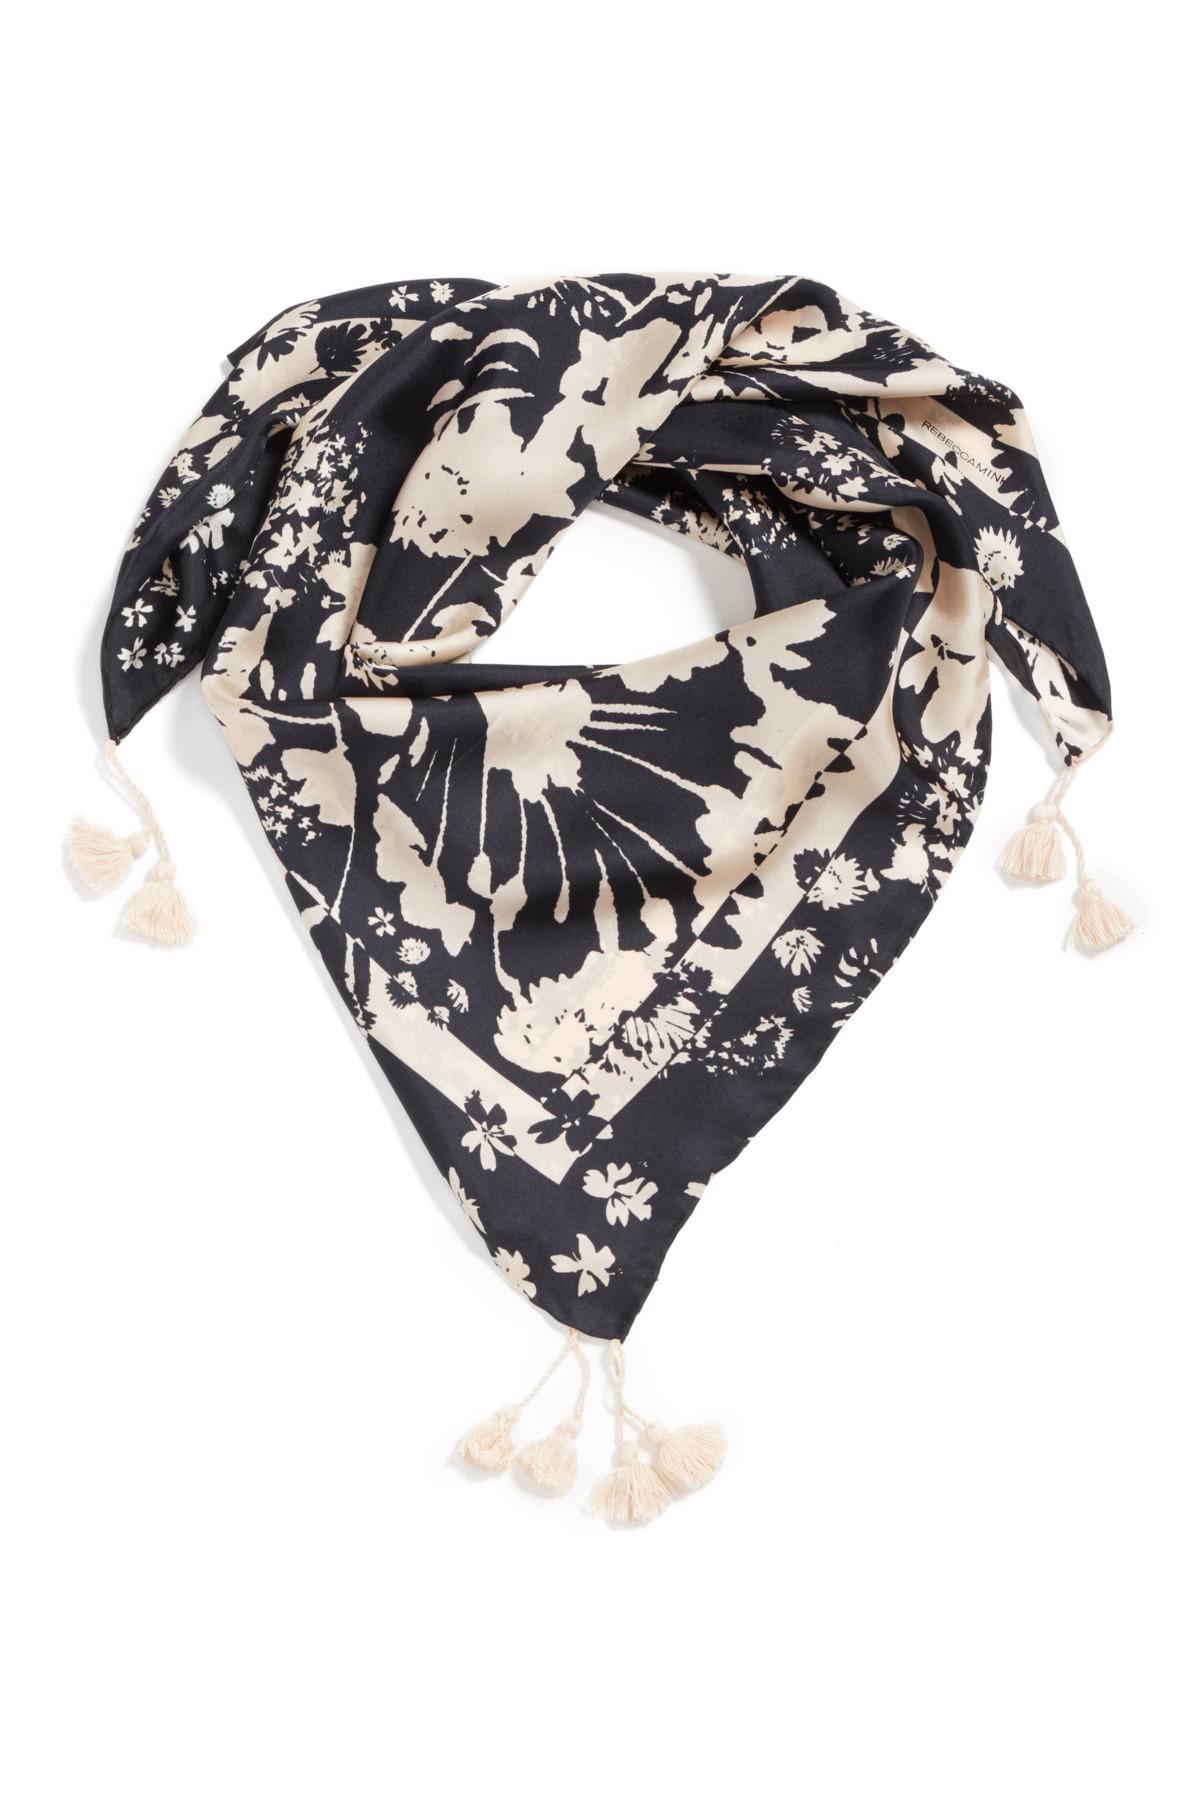 717ffc4312d8a Lyst - Rebecca Minkoff Watercolor Garden Square Silk Scarf in Black